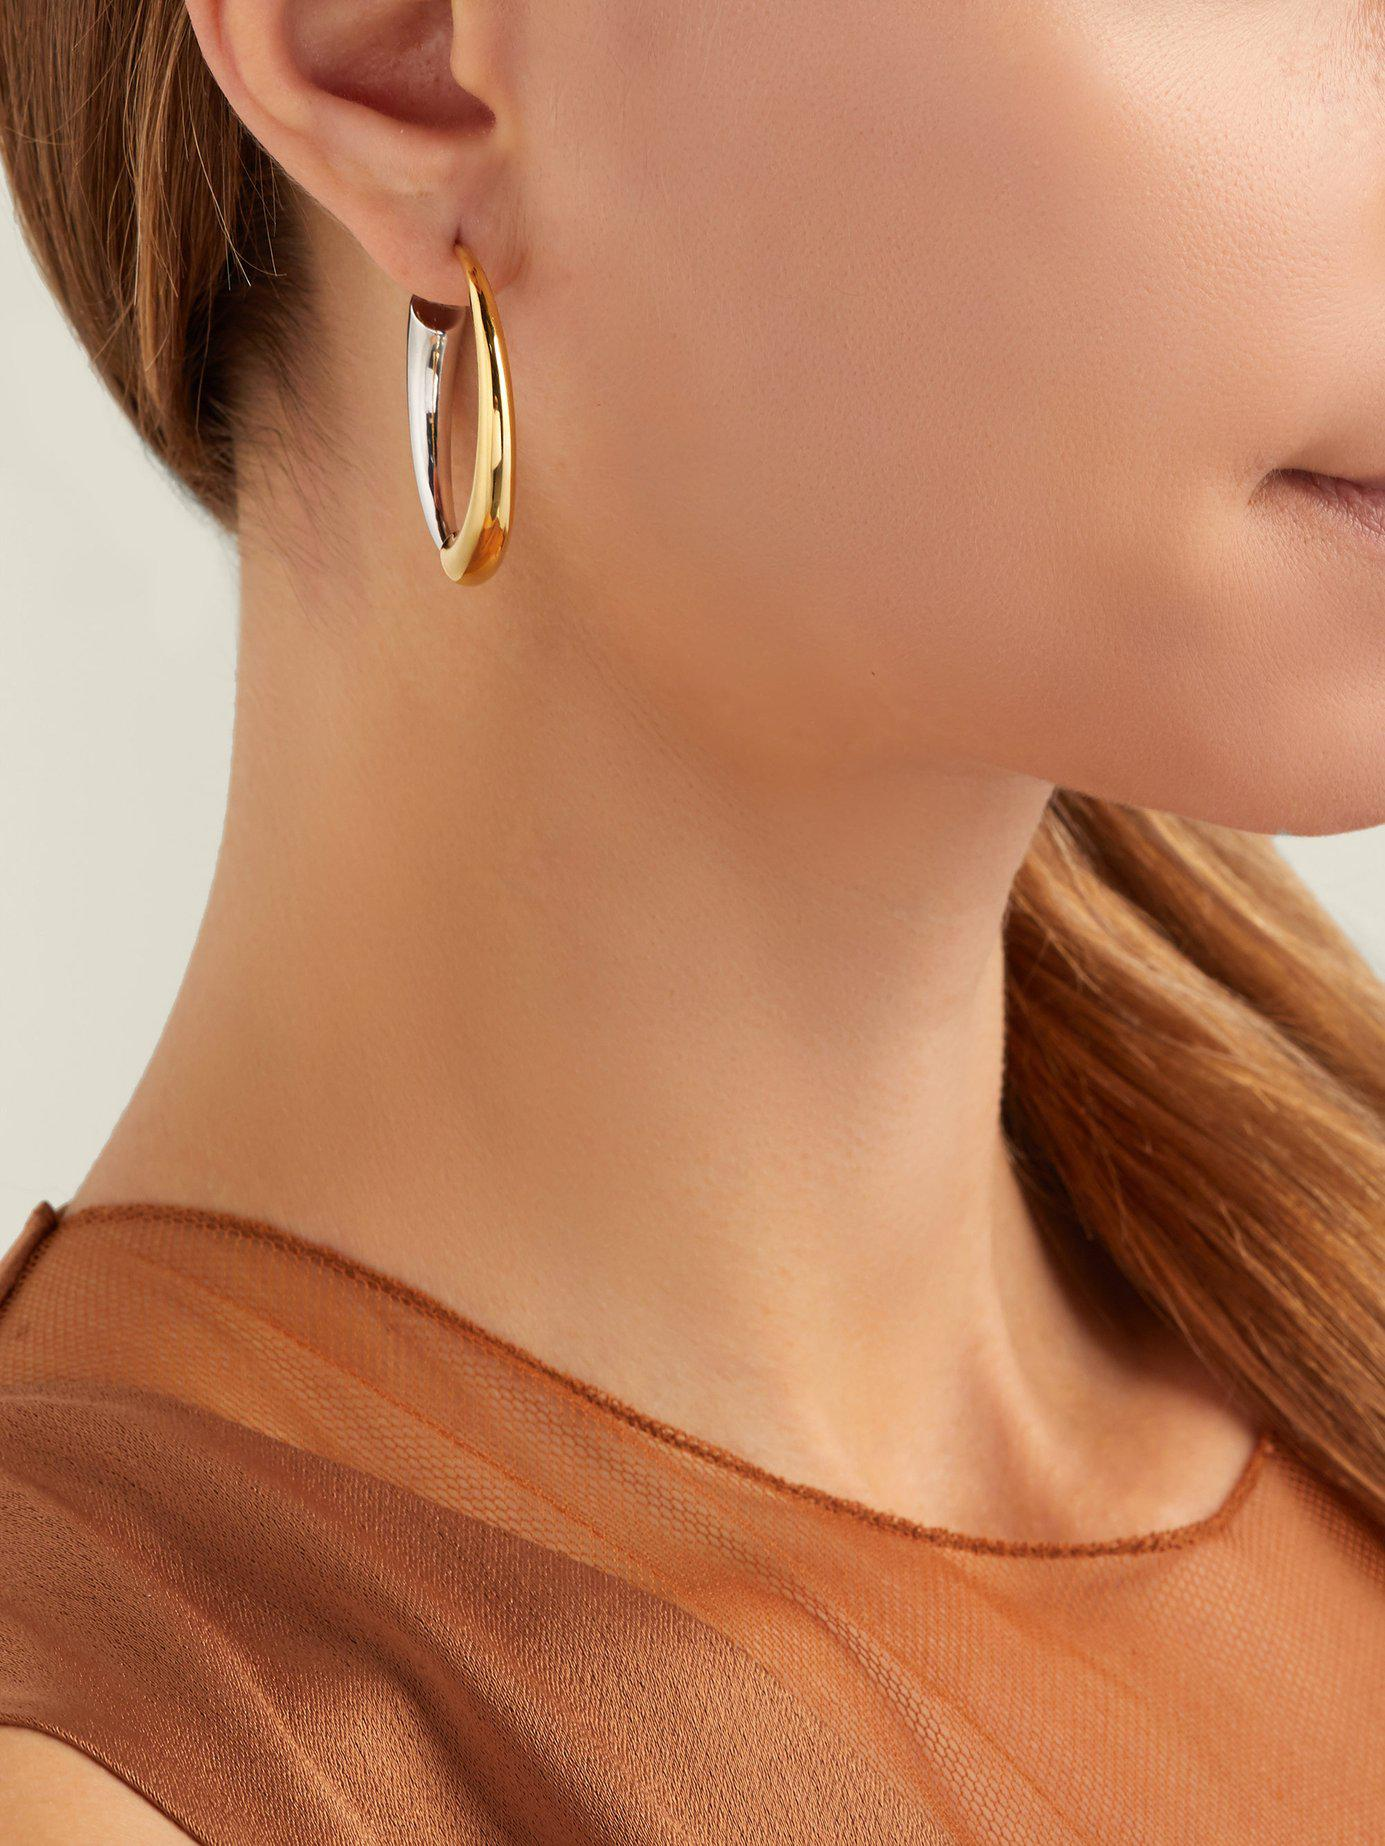 7bfe7814c18195 Lyst - Charlotte Chesnais Gia Vermeil & Silver Hoop Earrings in Metallic -  Save 5%